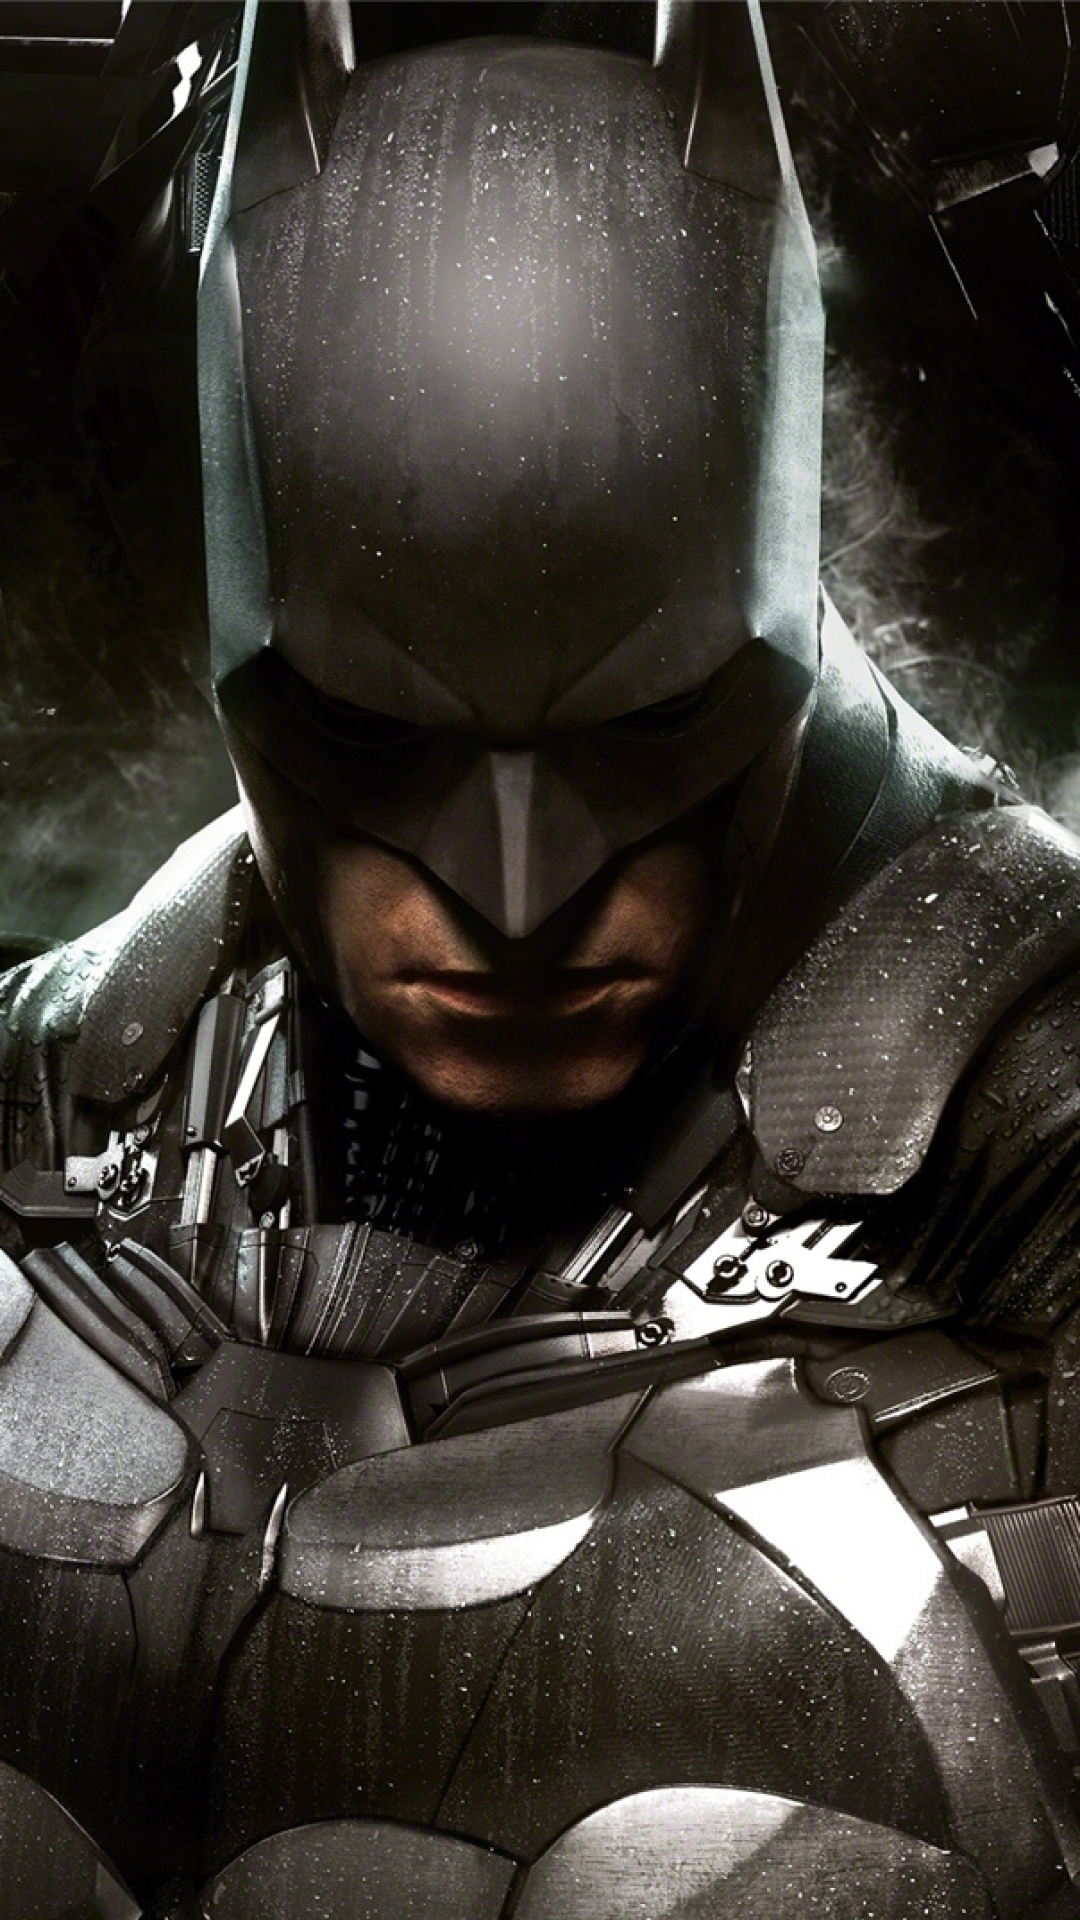 Hd Wallpapers Batman Iphone Hd Wallpapers, Backgrounds, - Batman Arkham Knight Iphone , HD Wallpaper & Backgrounds